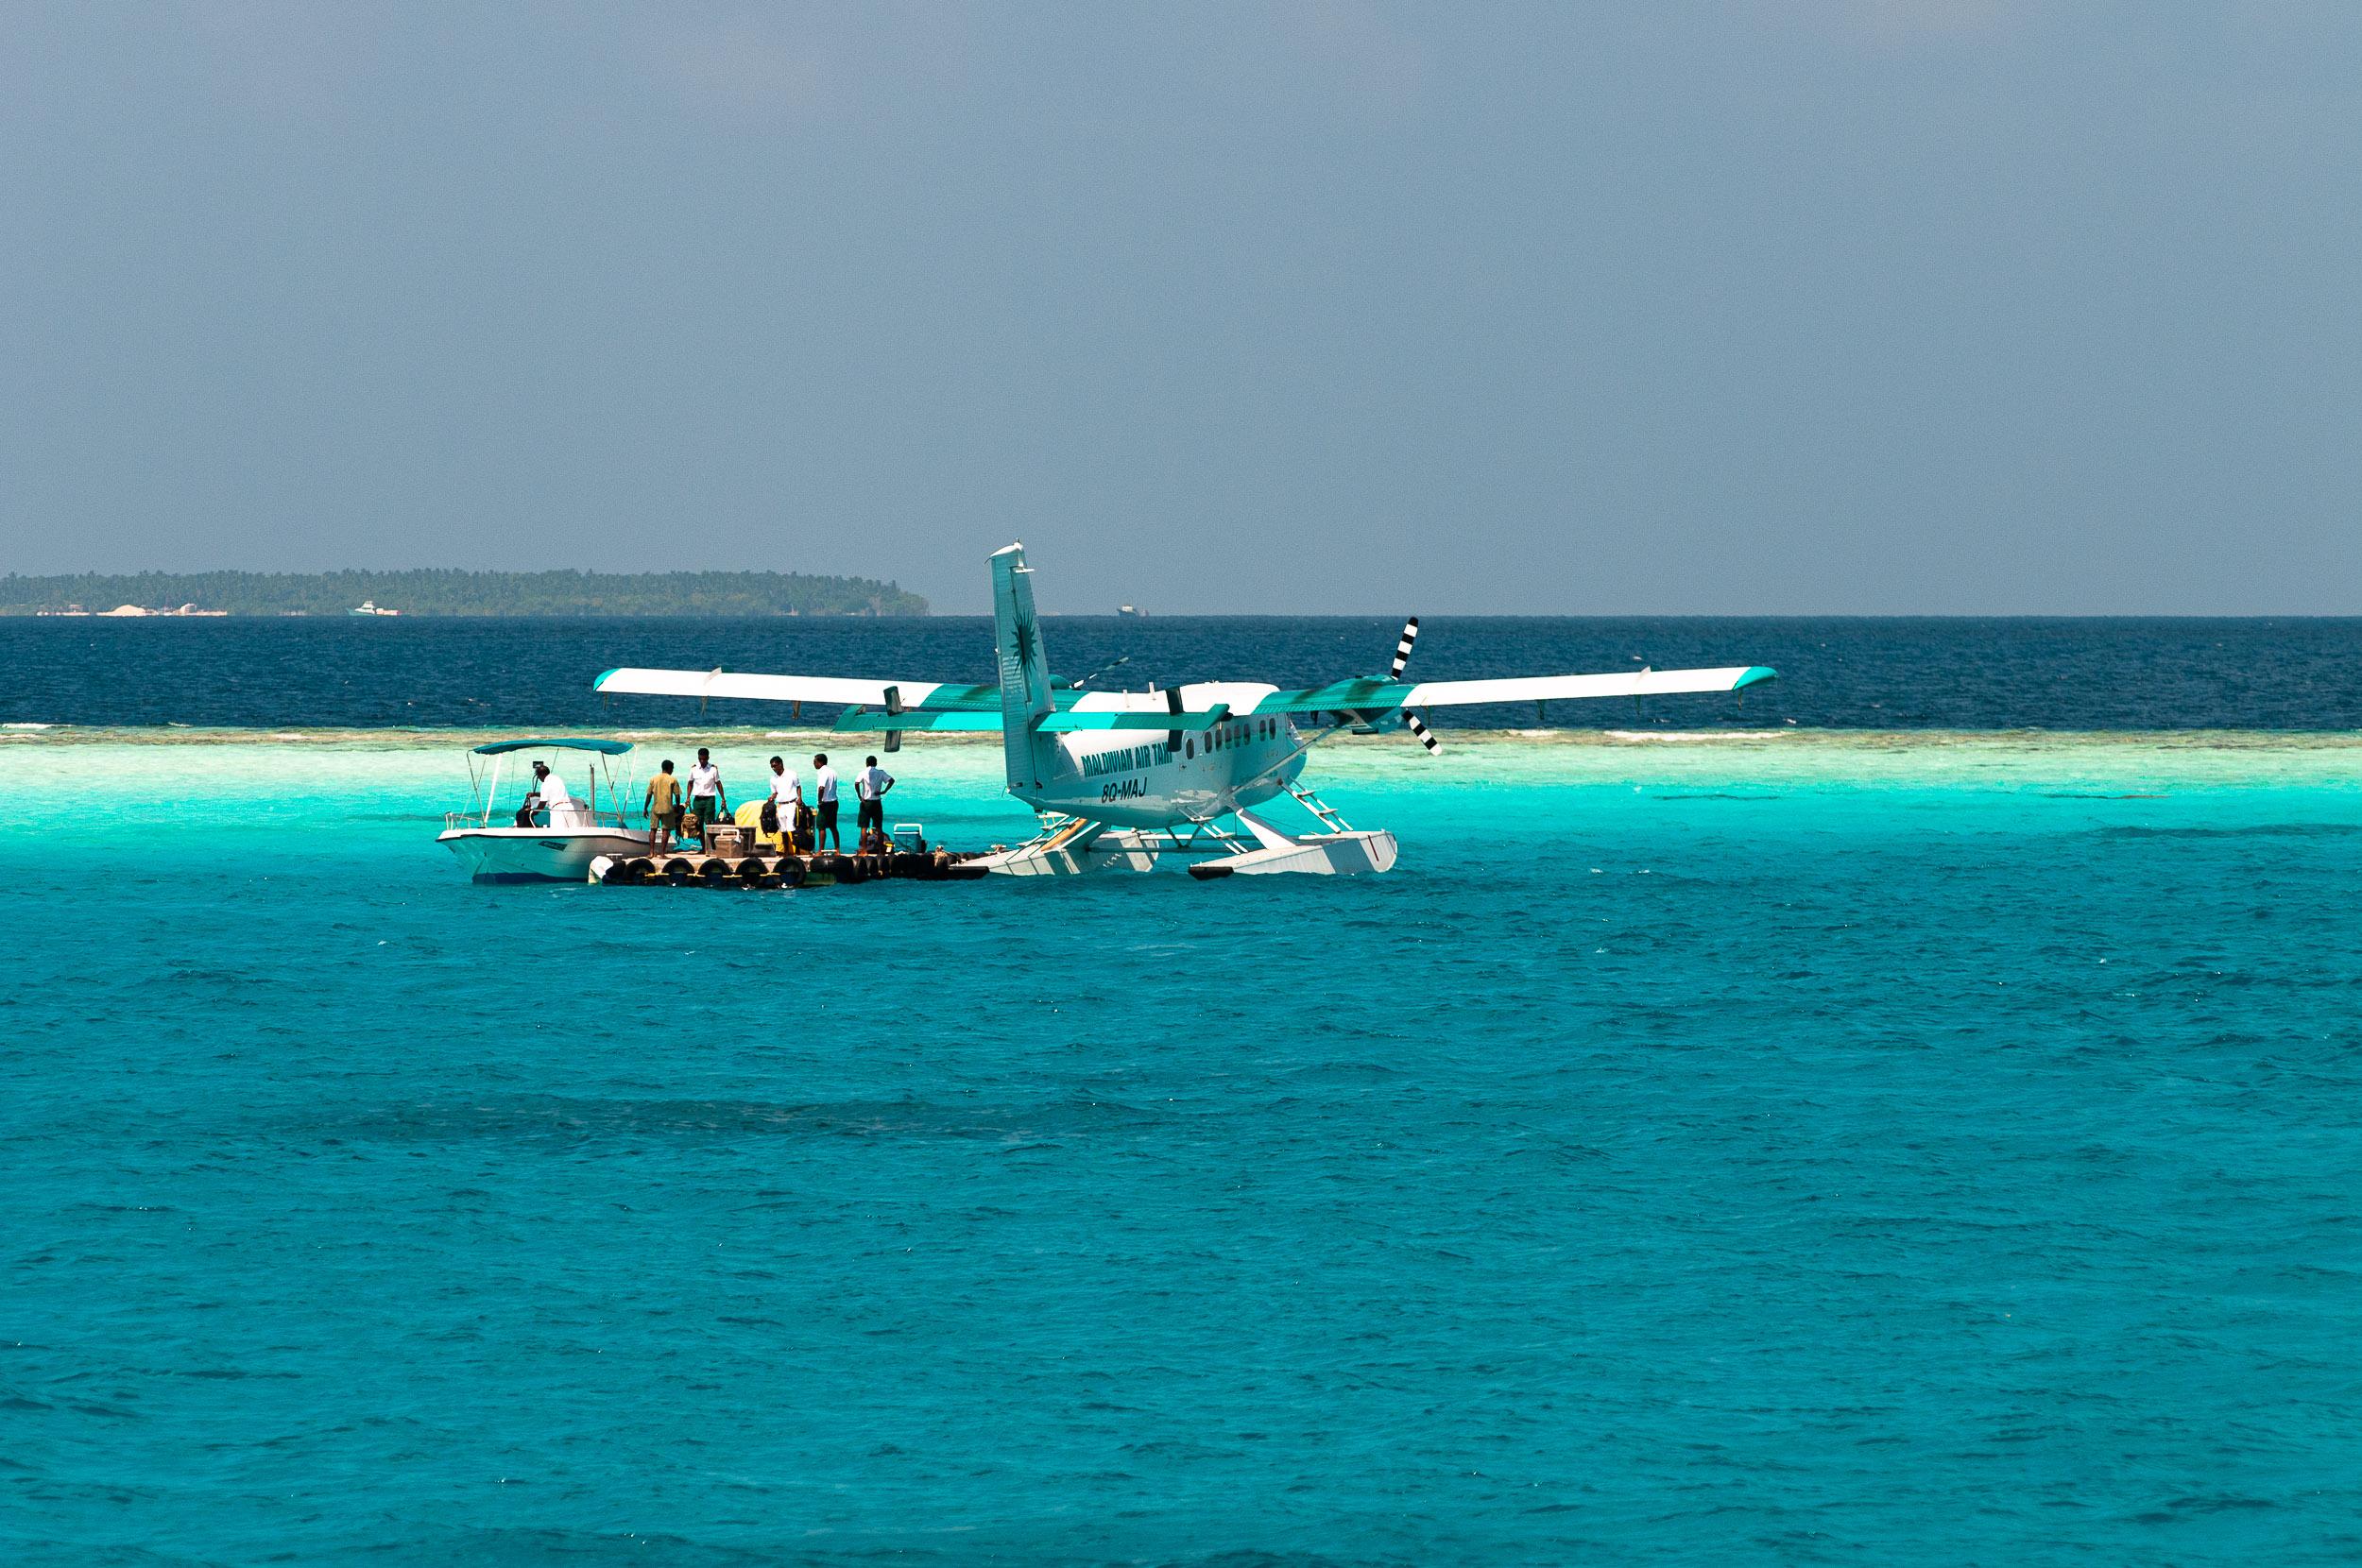 On route to Six Senses Resort in the Maldives. © www.thomaspickard.com